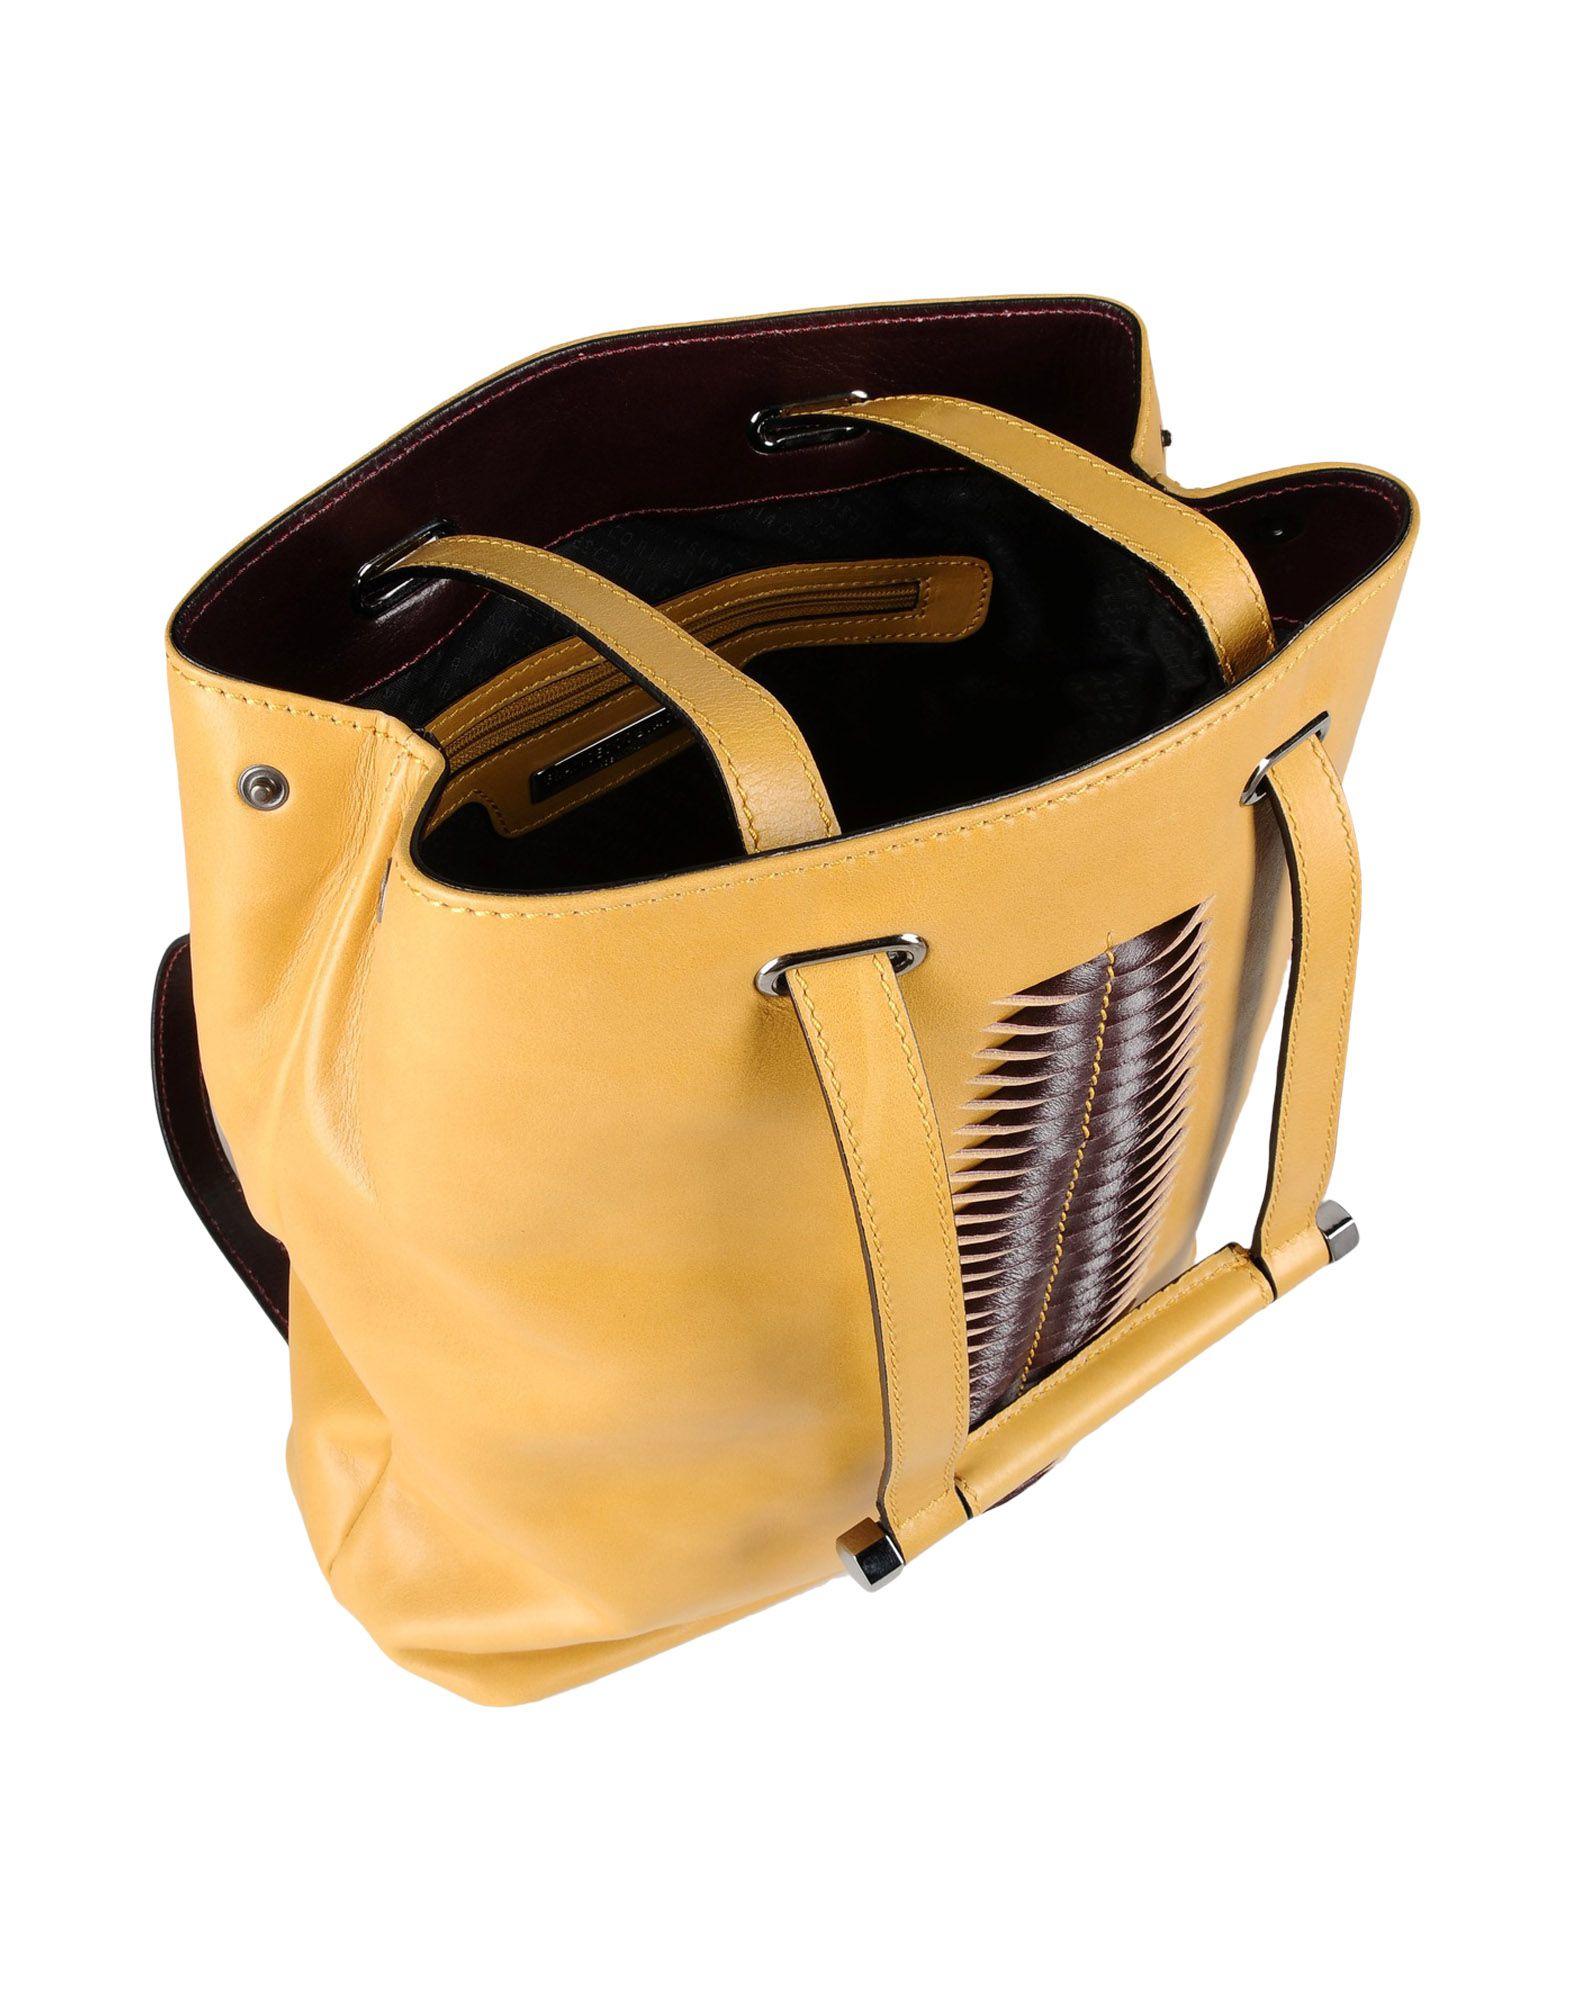 Francesco Biasia Leather Backpacks & Fanny Packs in Yellow